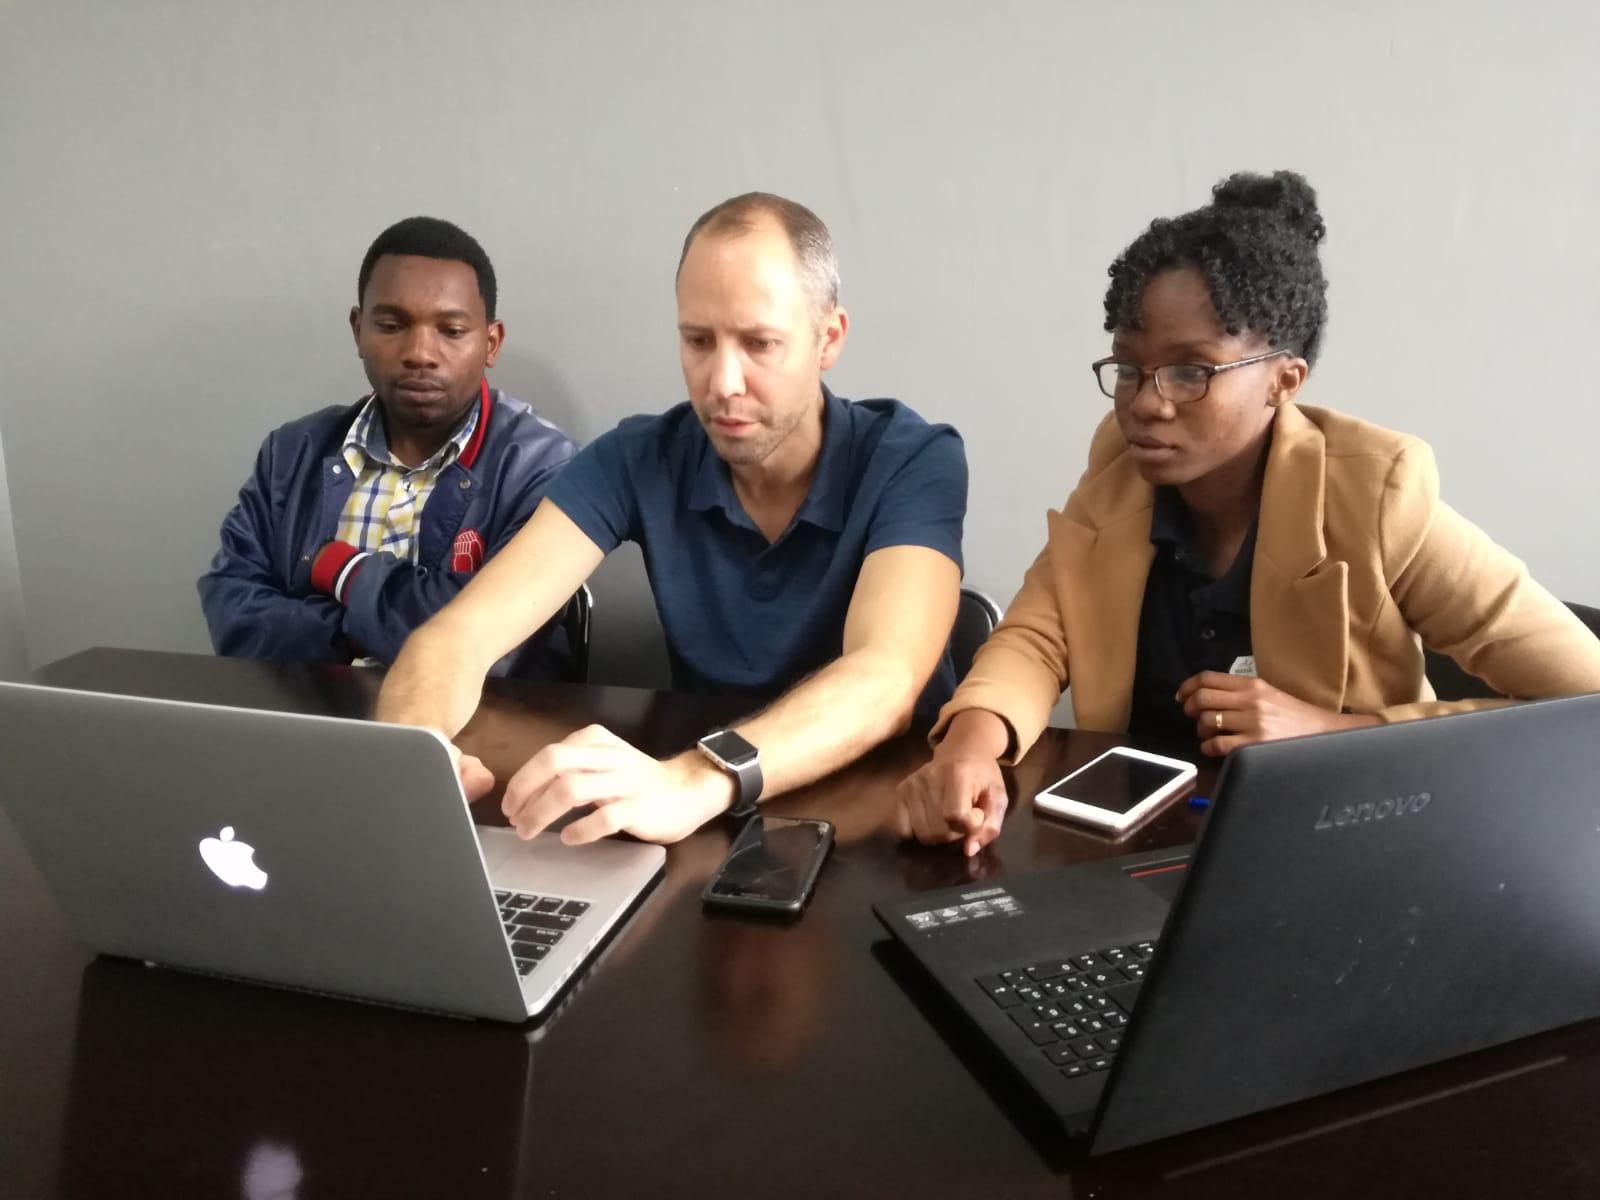 Darren mentoring entrepreneurs at Anza